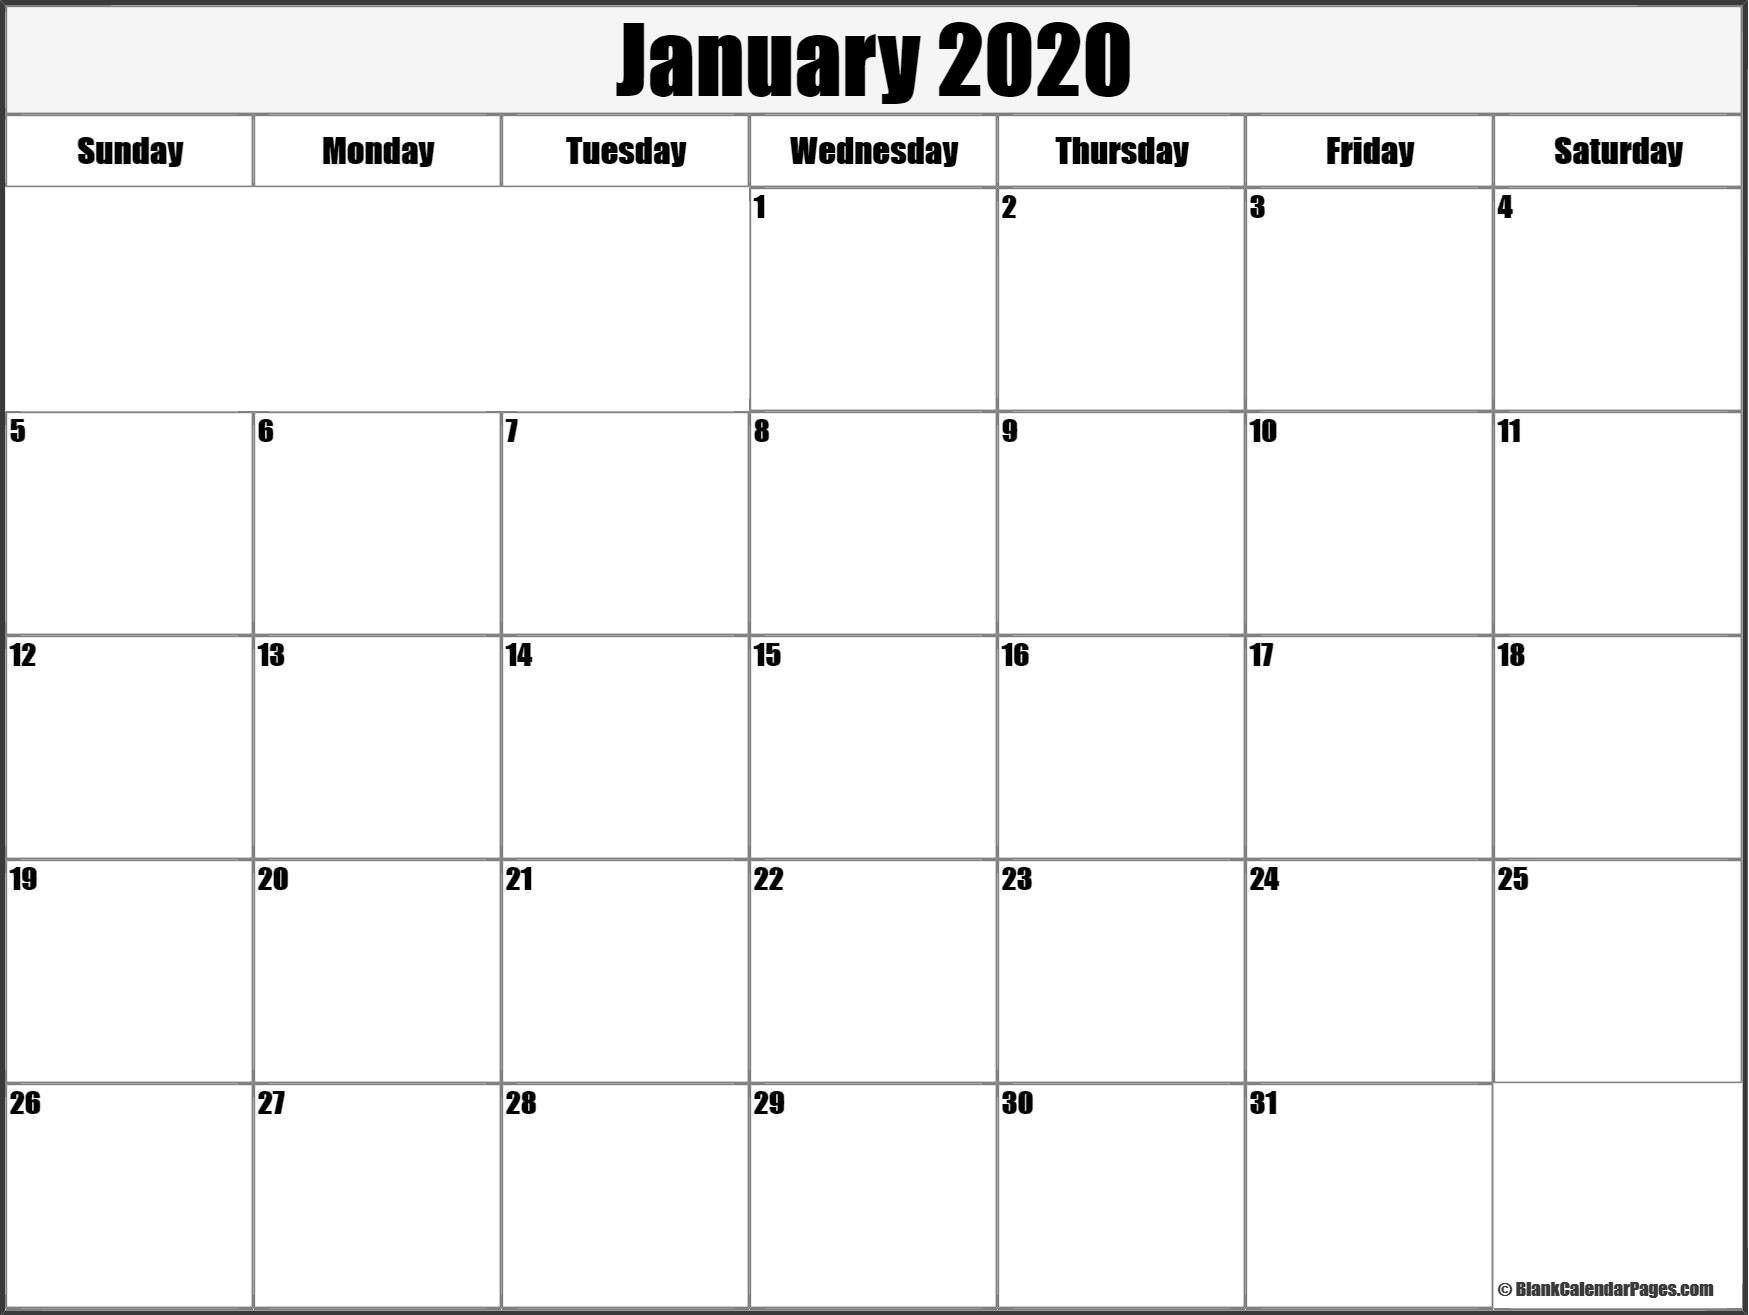 January 2020 Calendar Template #january #january2020-January 2020 Calendar Kalnirnay